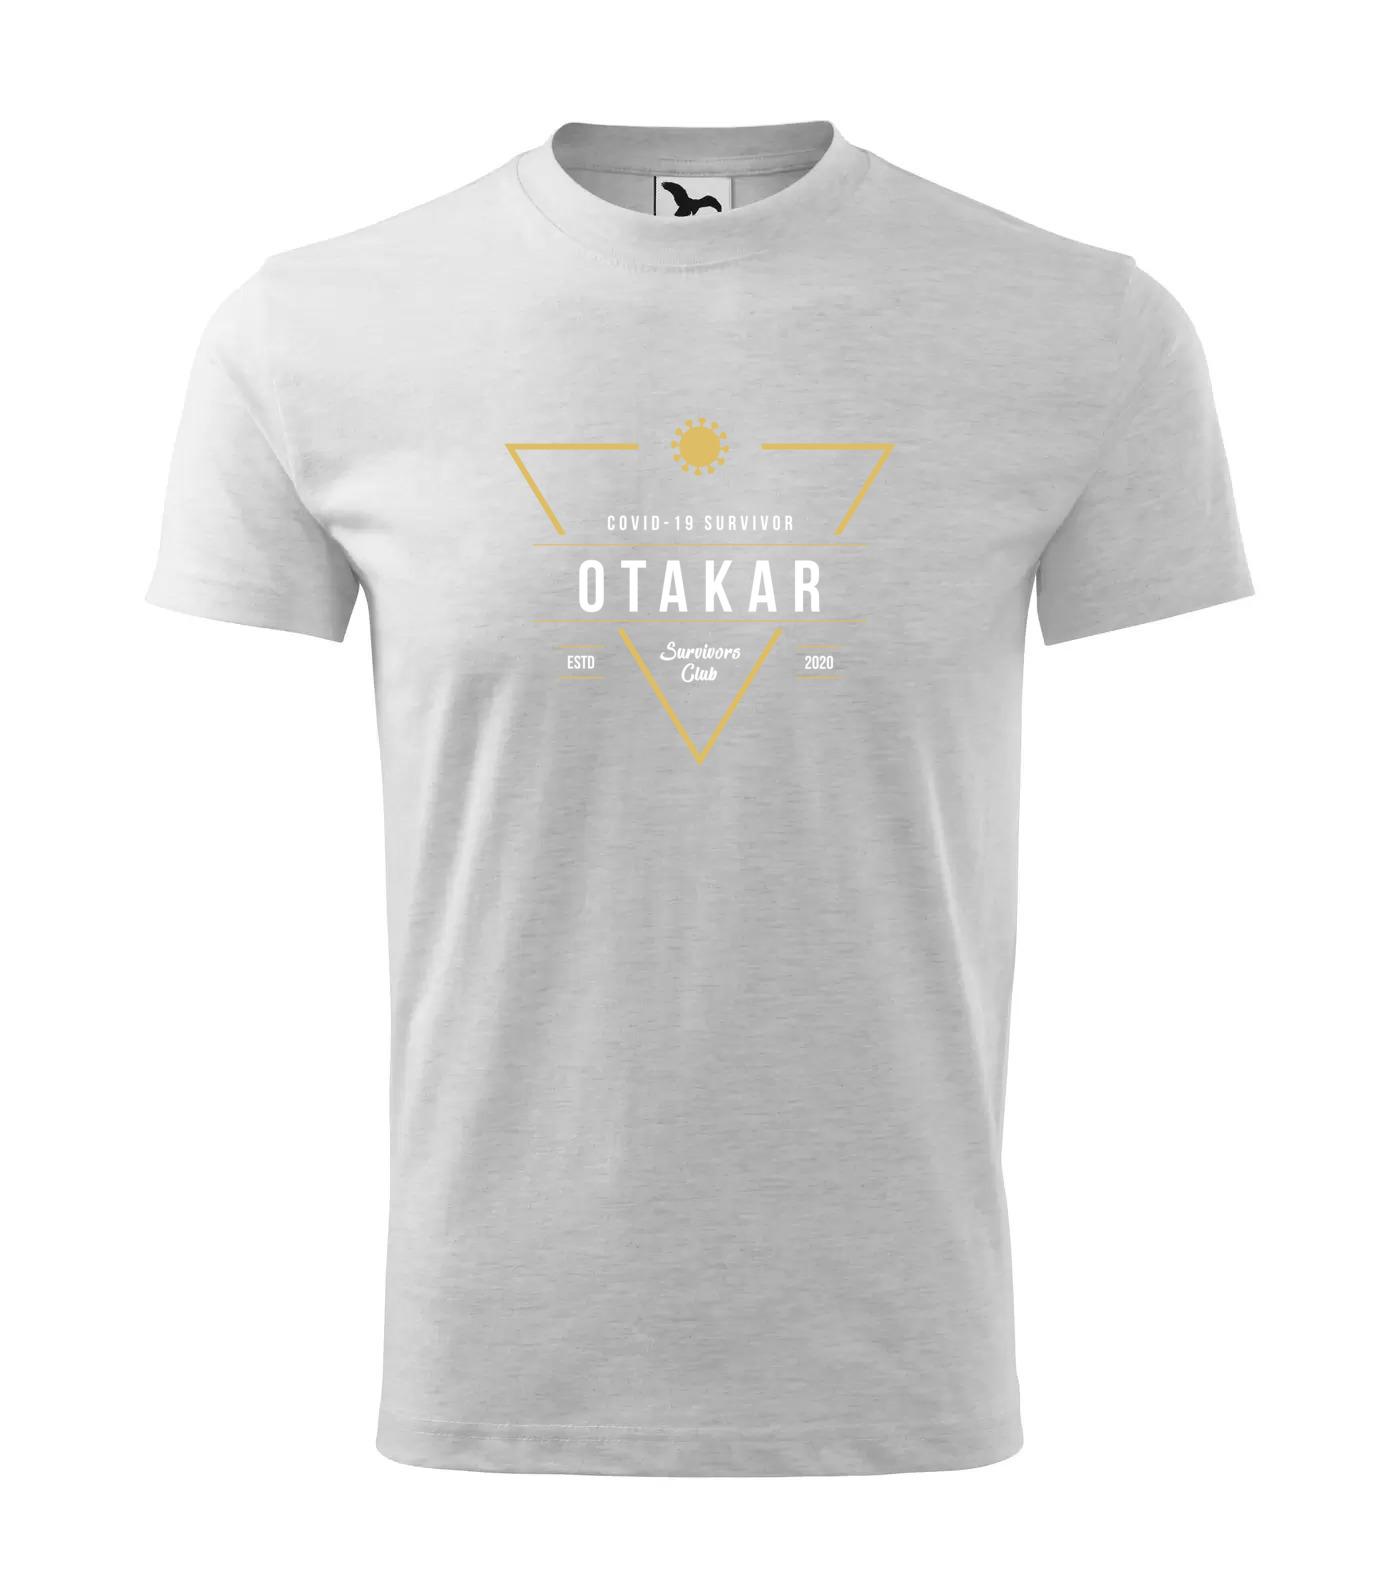 Tričko Survivor Club Otakar